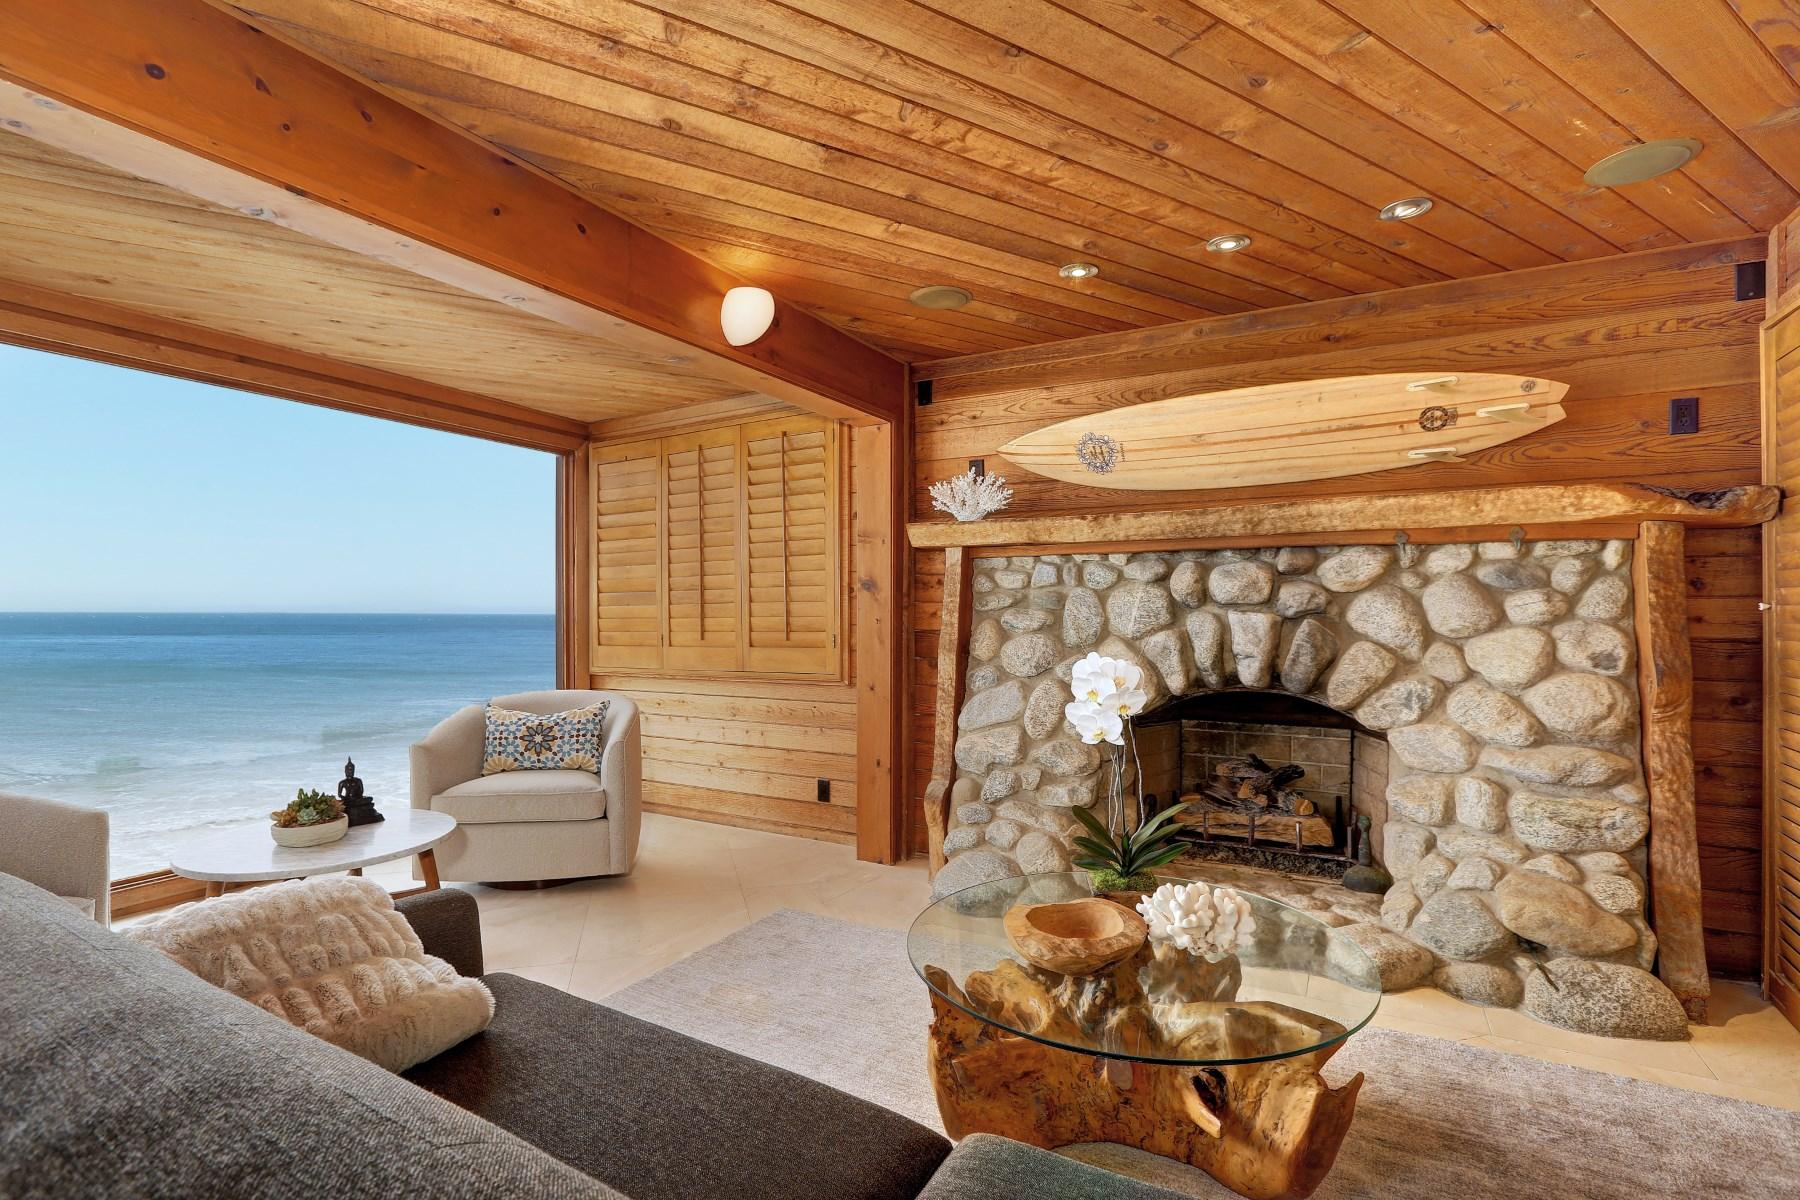 Moradia para Arrendamento às Fantastic Beach Front Rental 19056 Pacific Coast Hwy Malibu, Califórnia, 90265 Estados Unidos